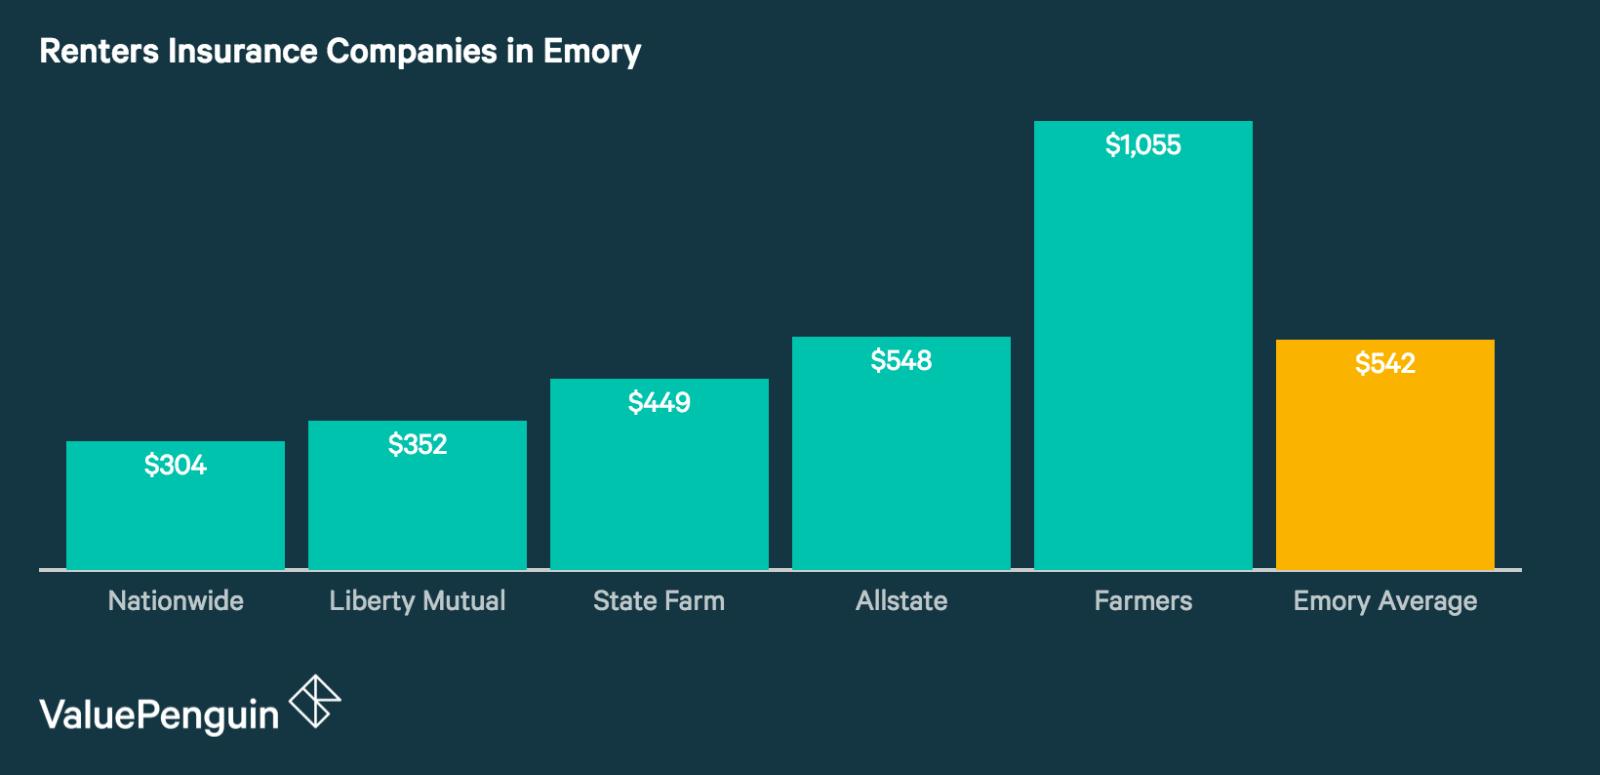 Emory's Best Renters Insurance Companies